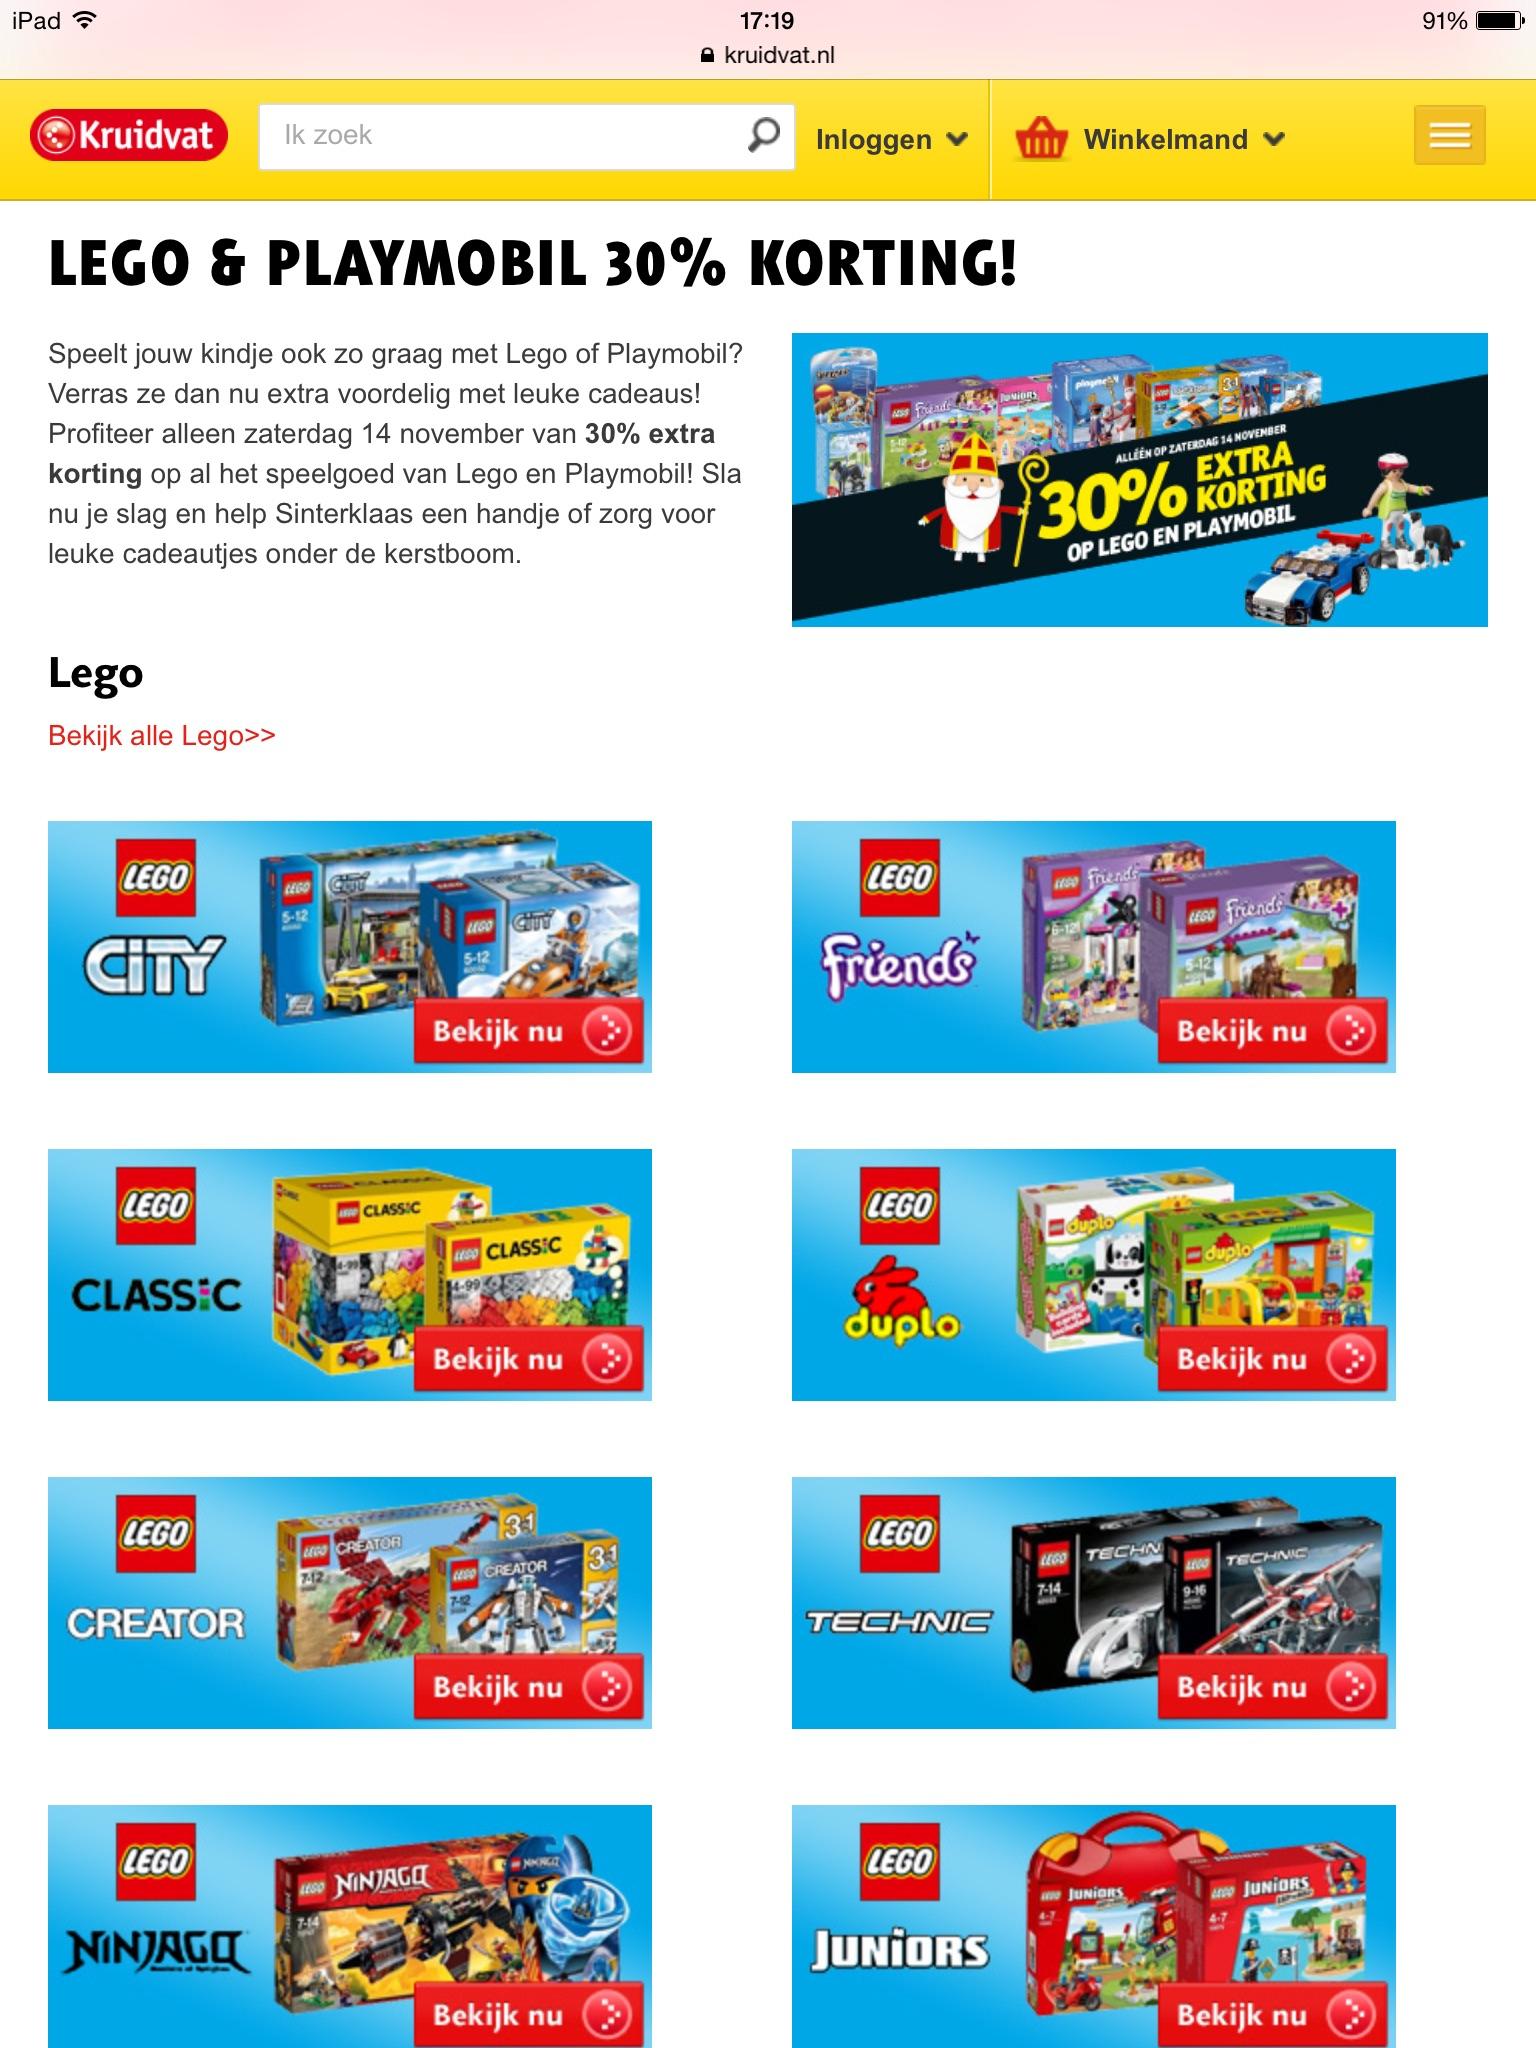 Bij het kruidvat zaterdag 14 november 30% korting op lego & playmobil